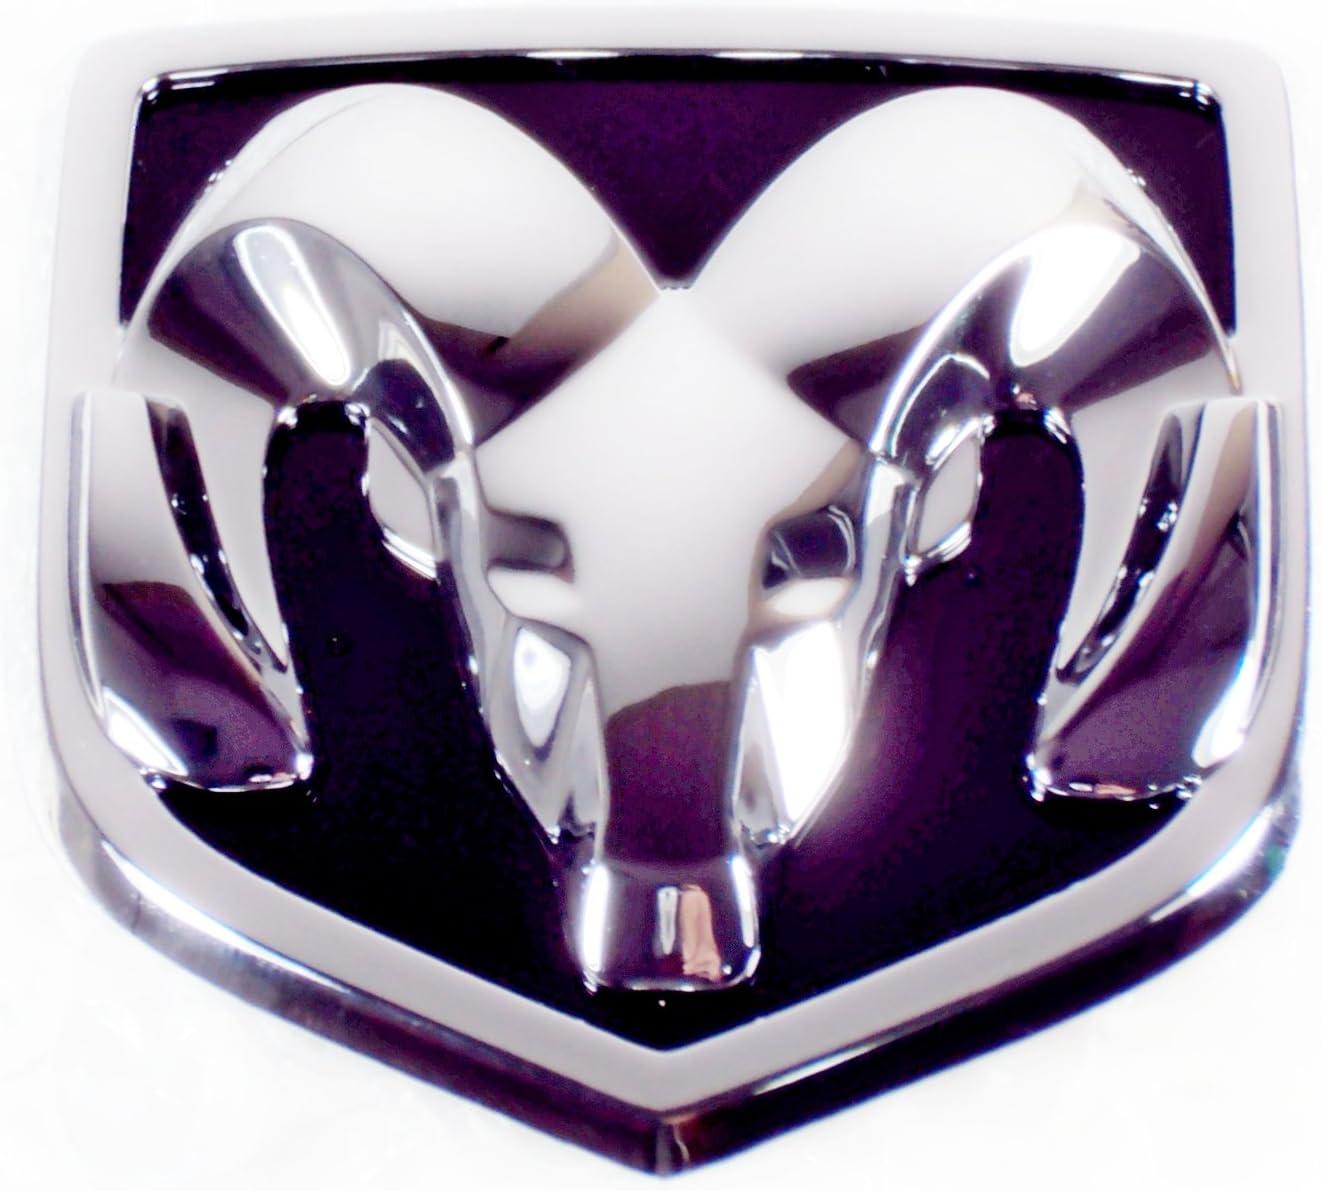 Matte Black 3D RAMS Head Mopar Front Grille Emblem for DODGE RAM 1500 2500 3500